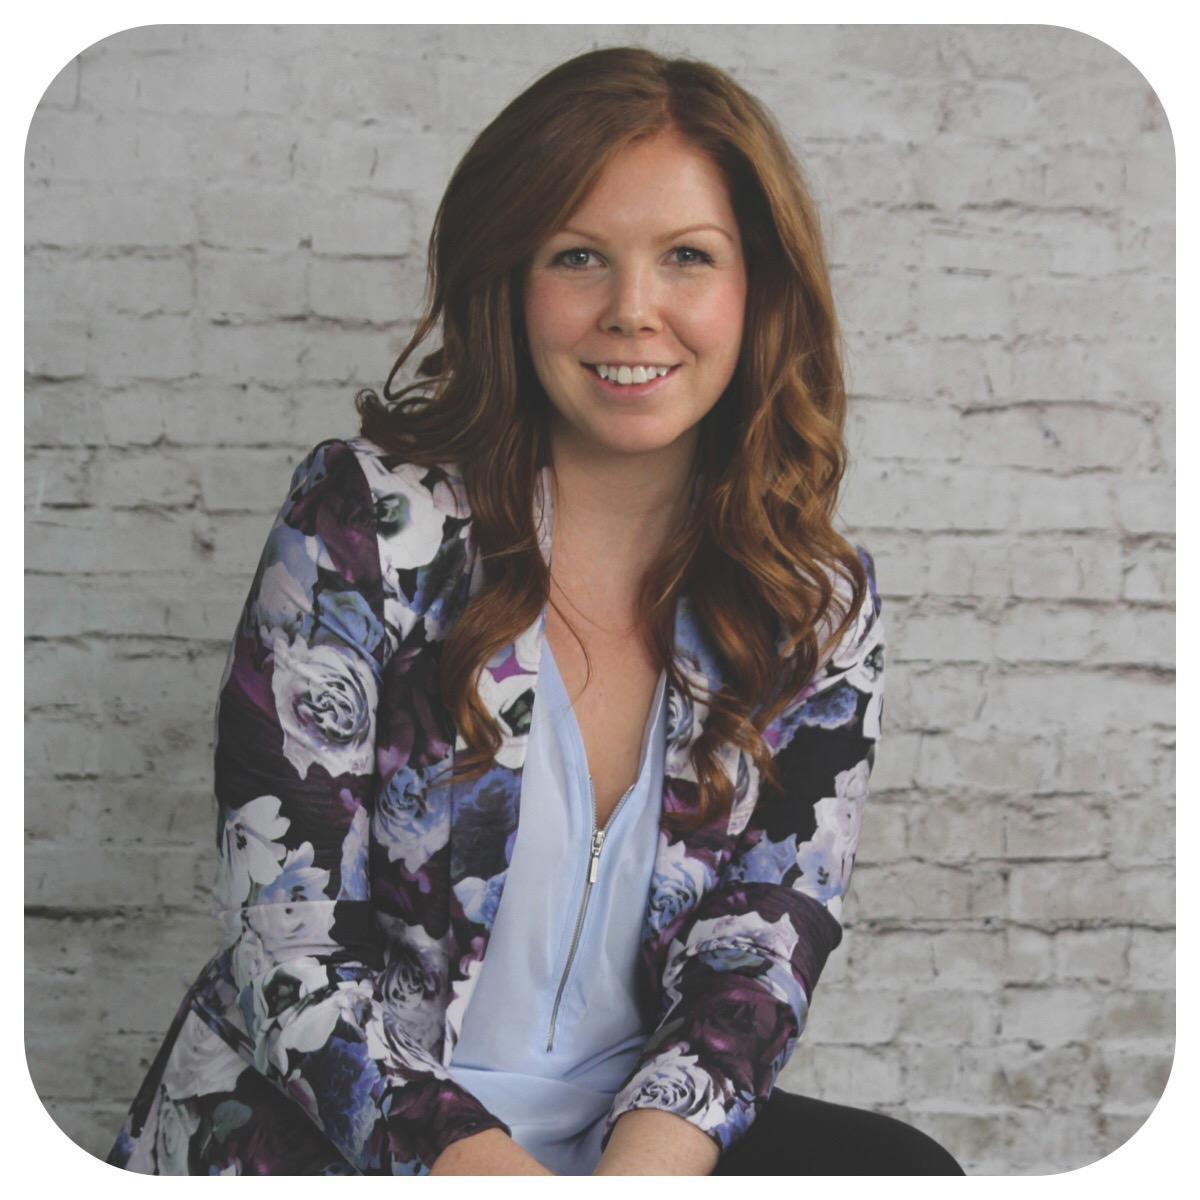 Healthy Living Now - Dana Goodfellow, RMT - Contributors - Meet Our Team